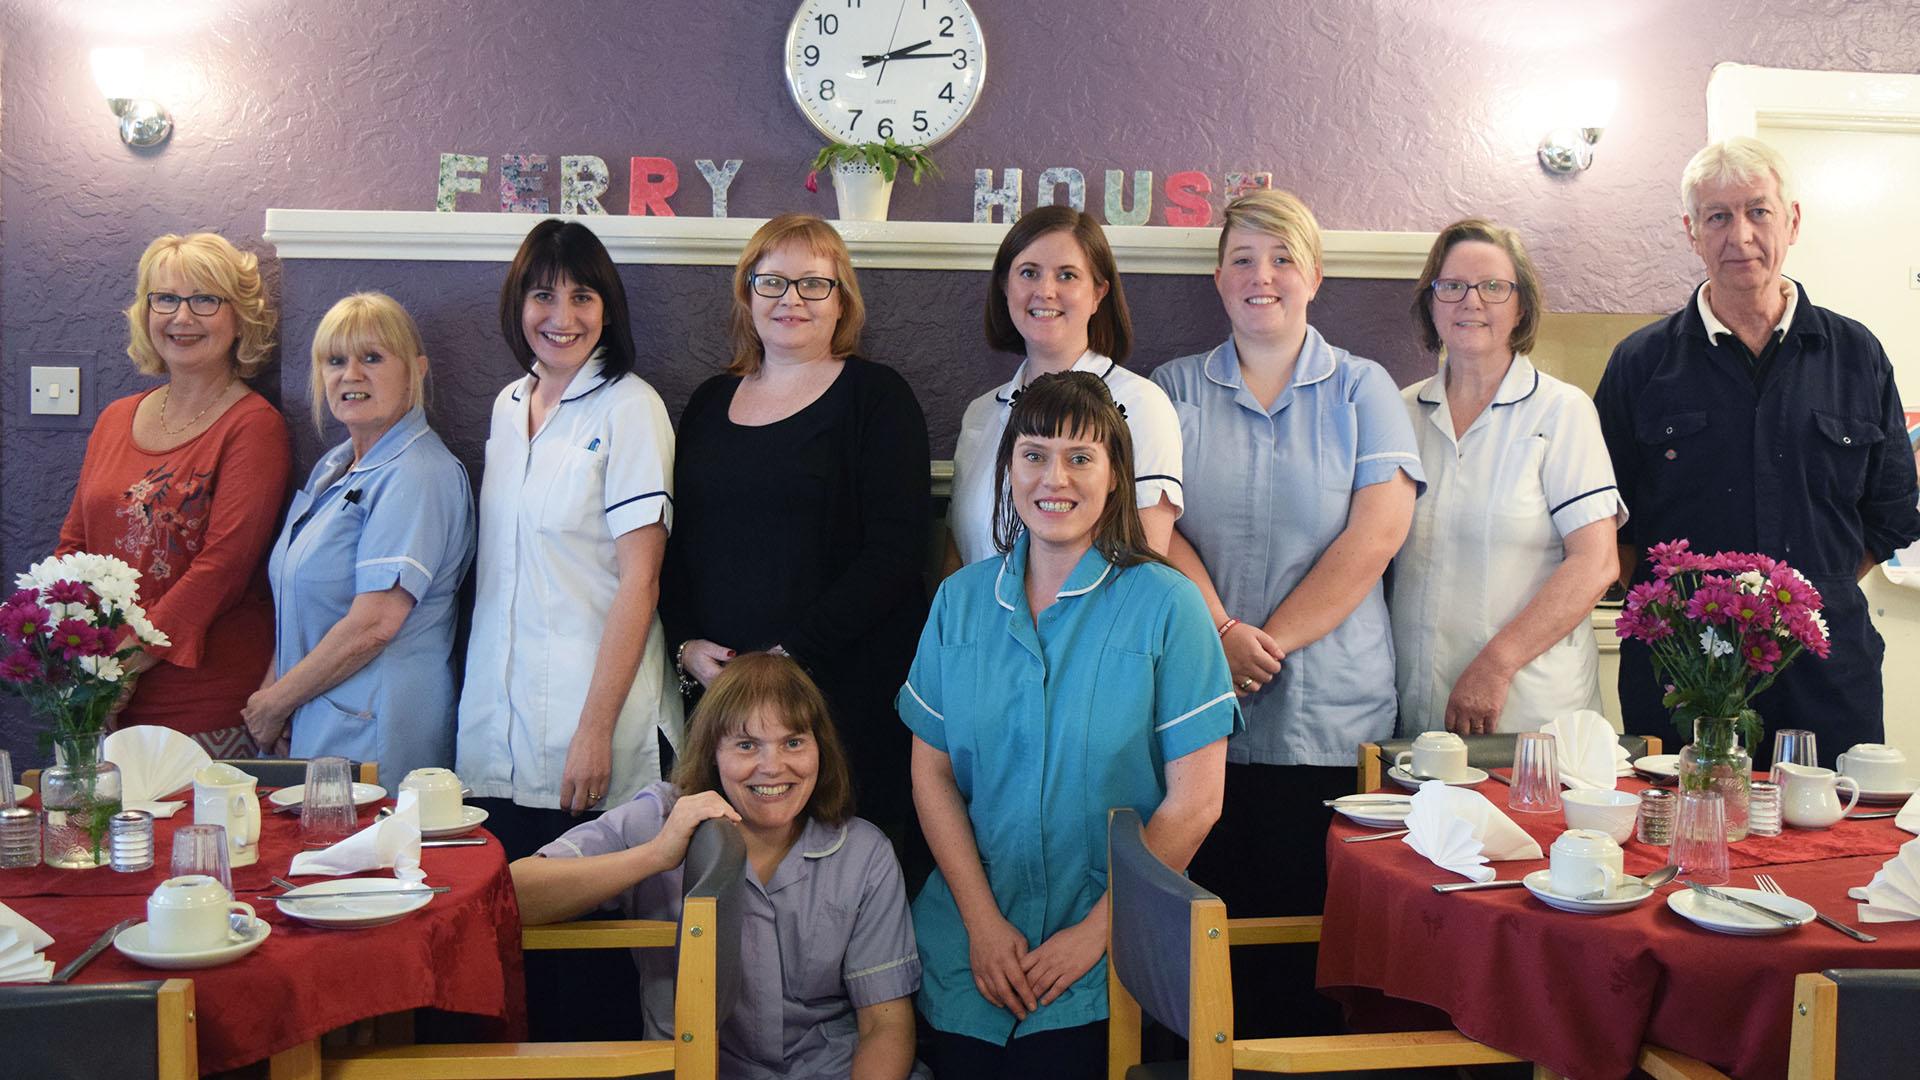 ferry house carer team